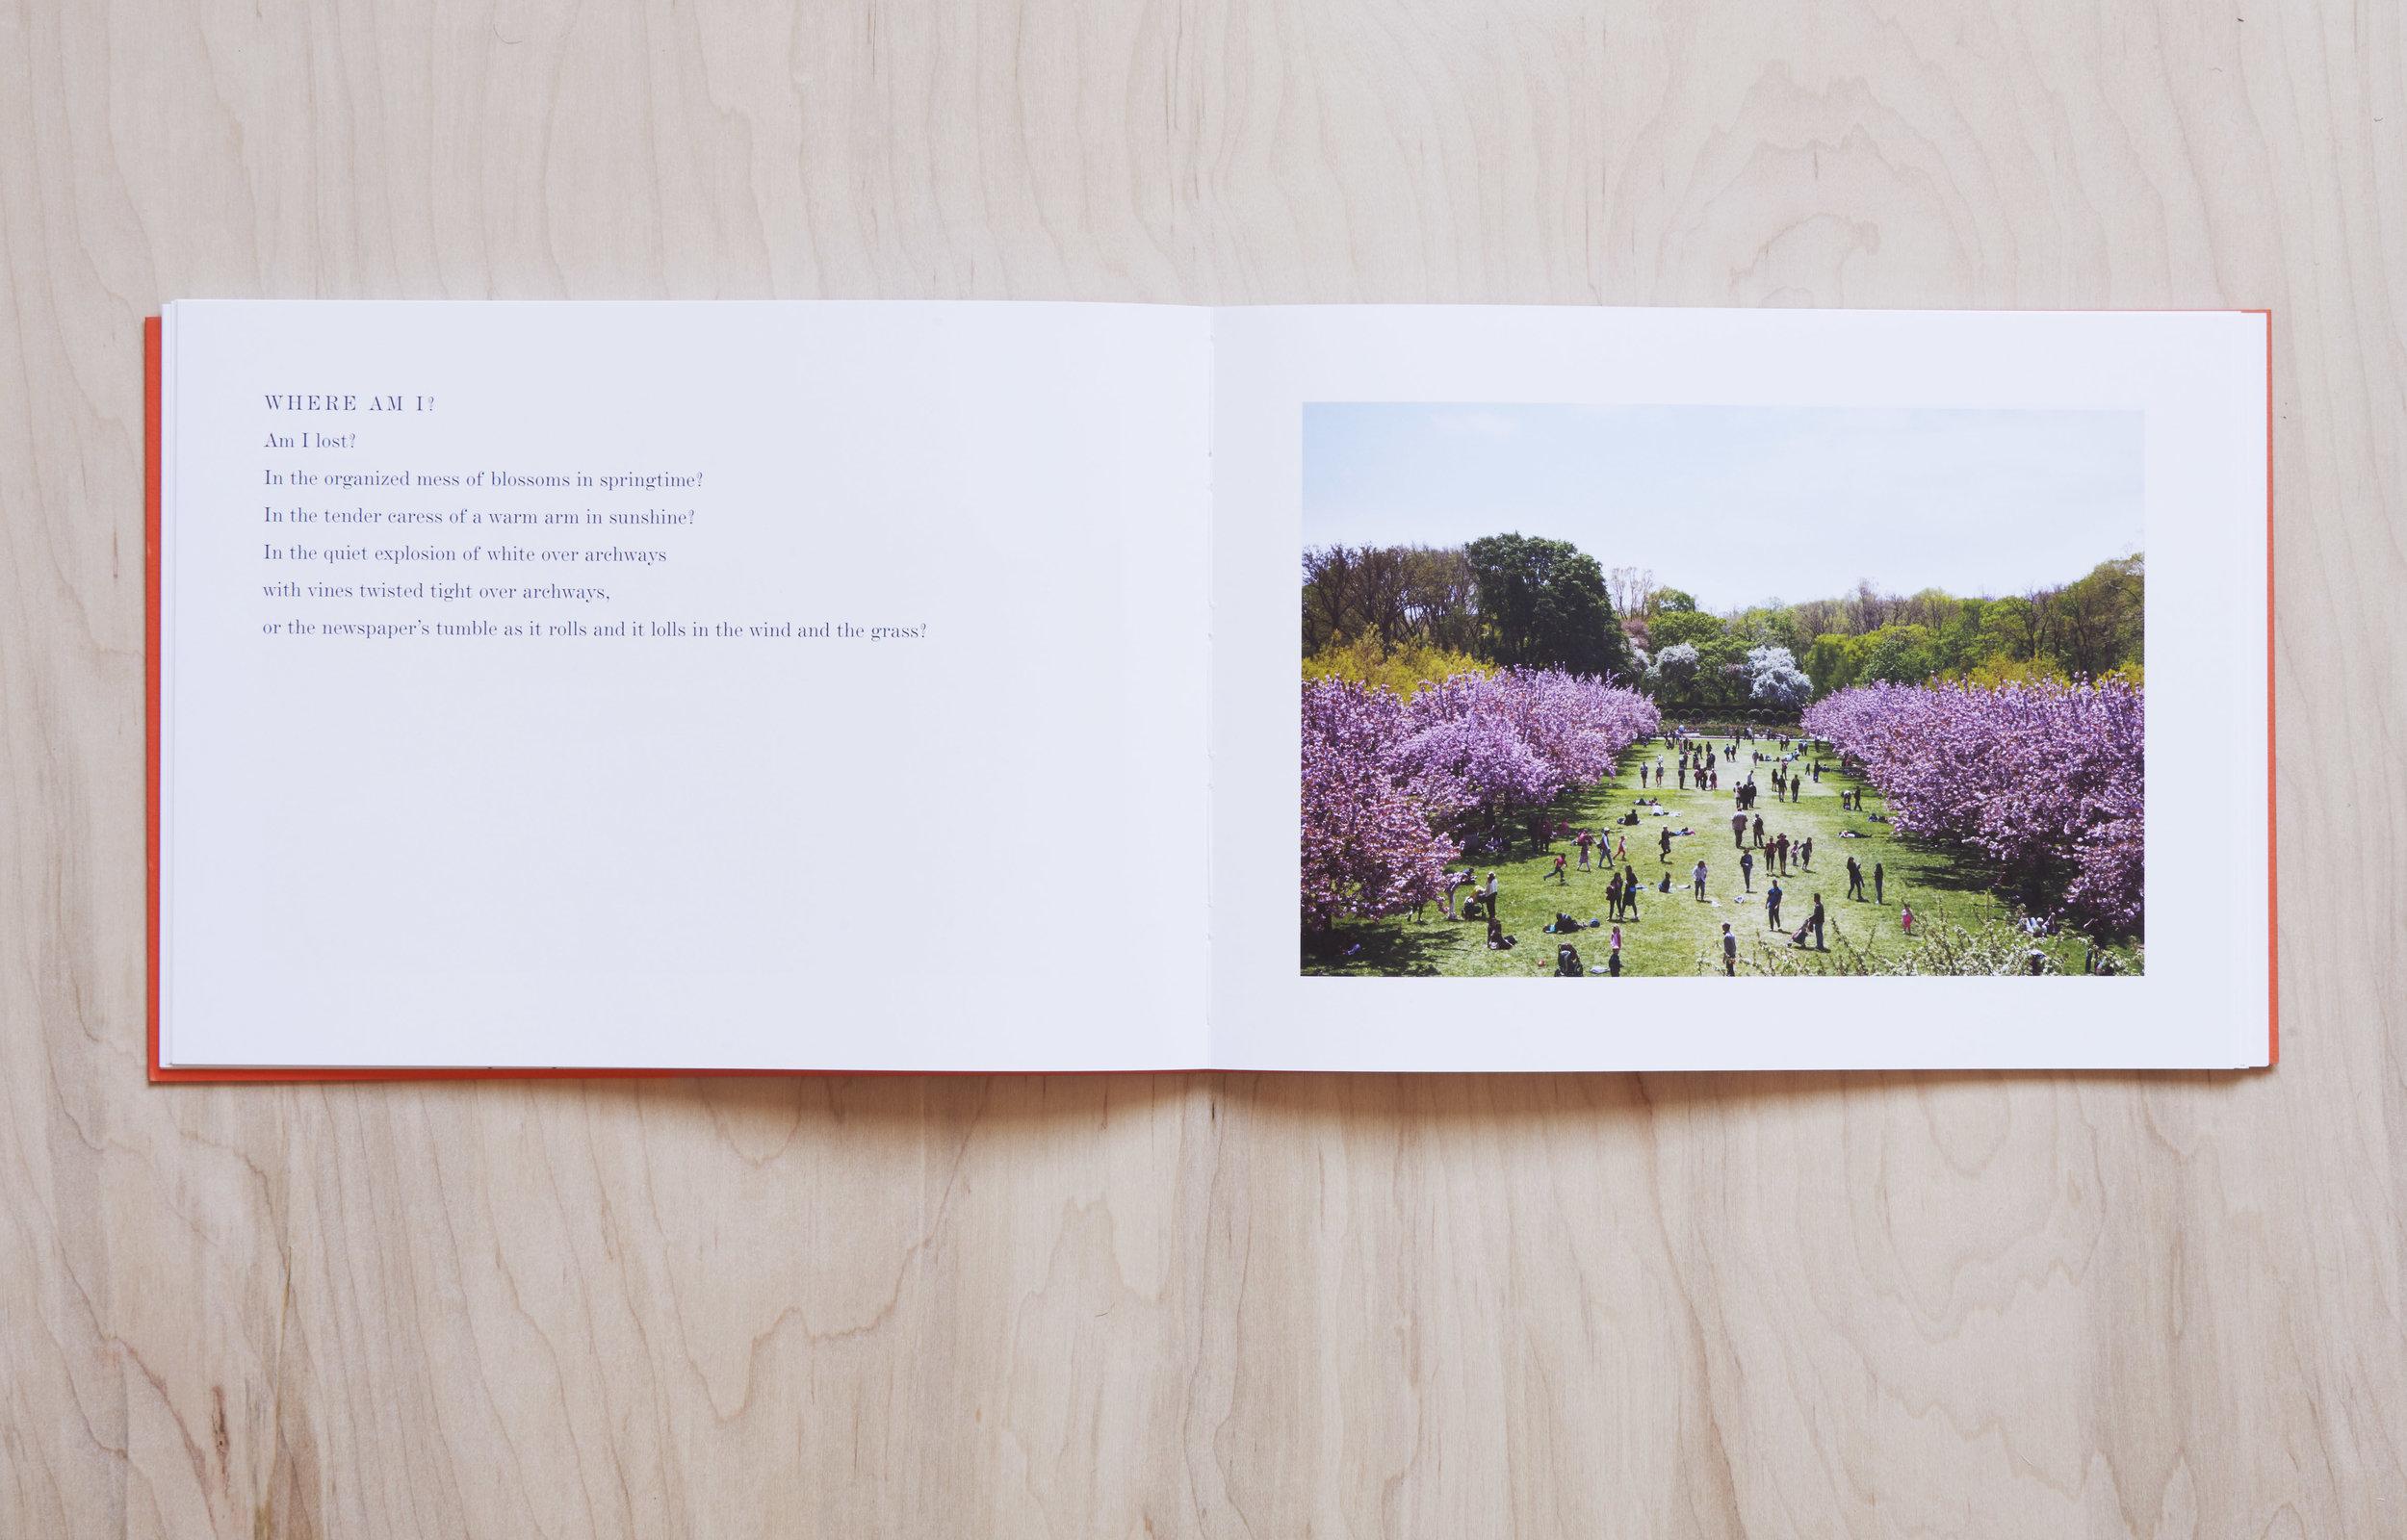 2019_03_04_bookproject_0245_v2.jpg